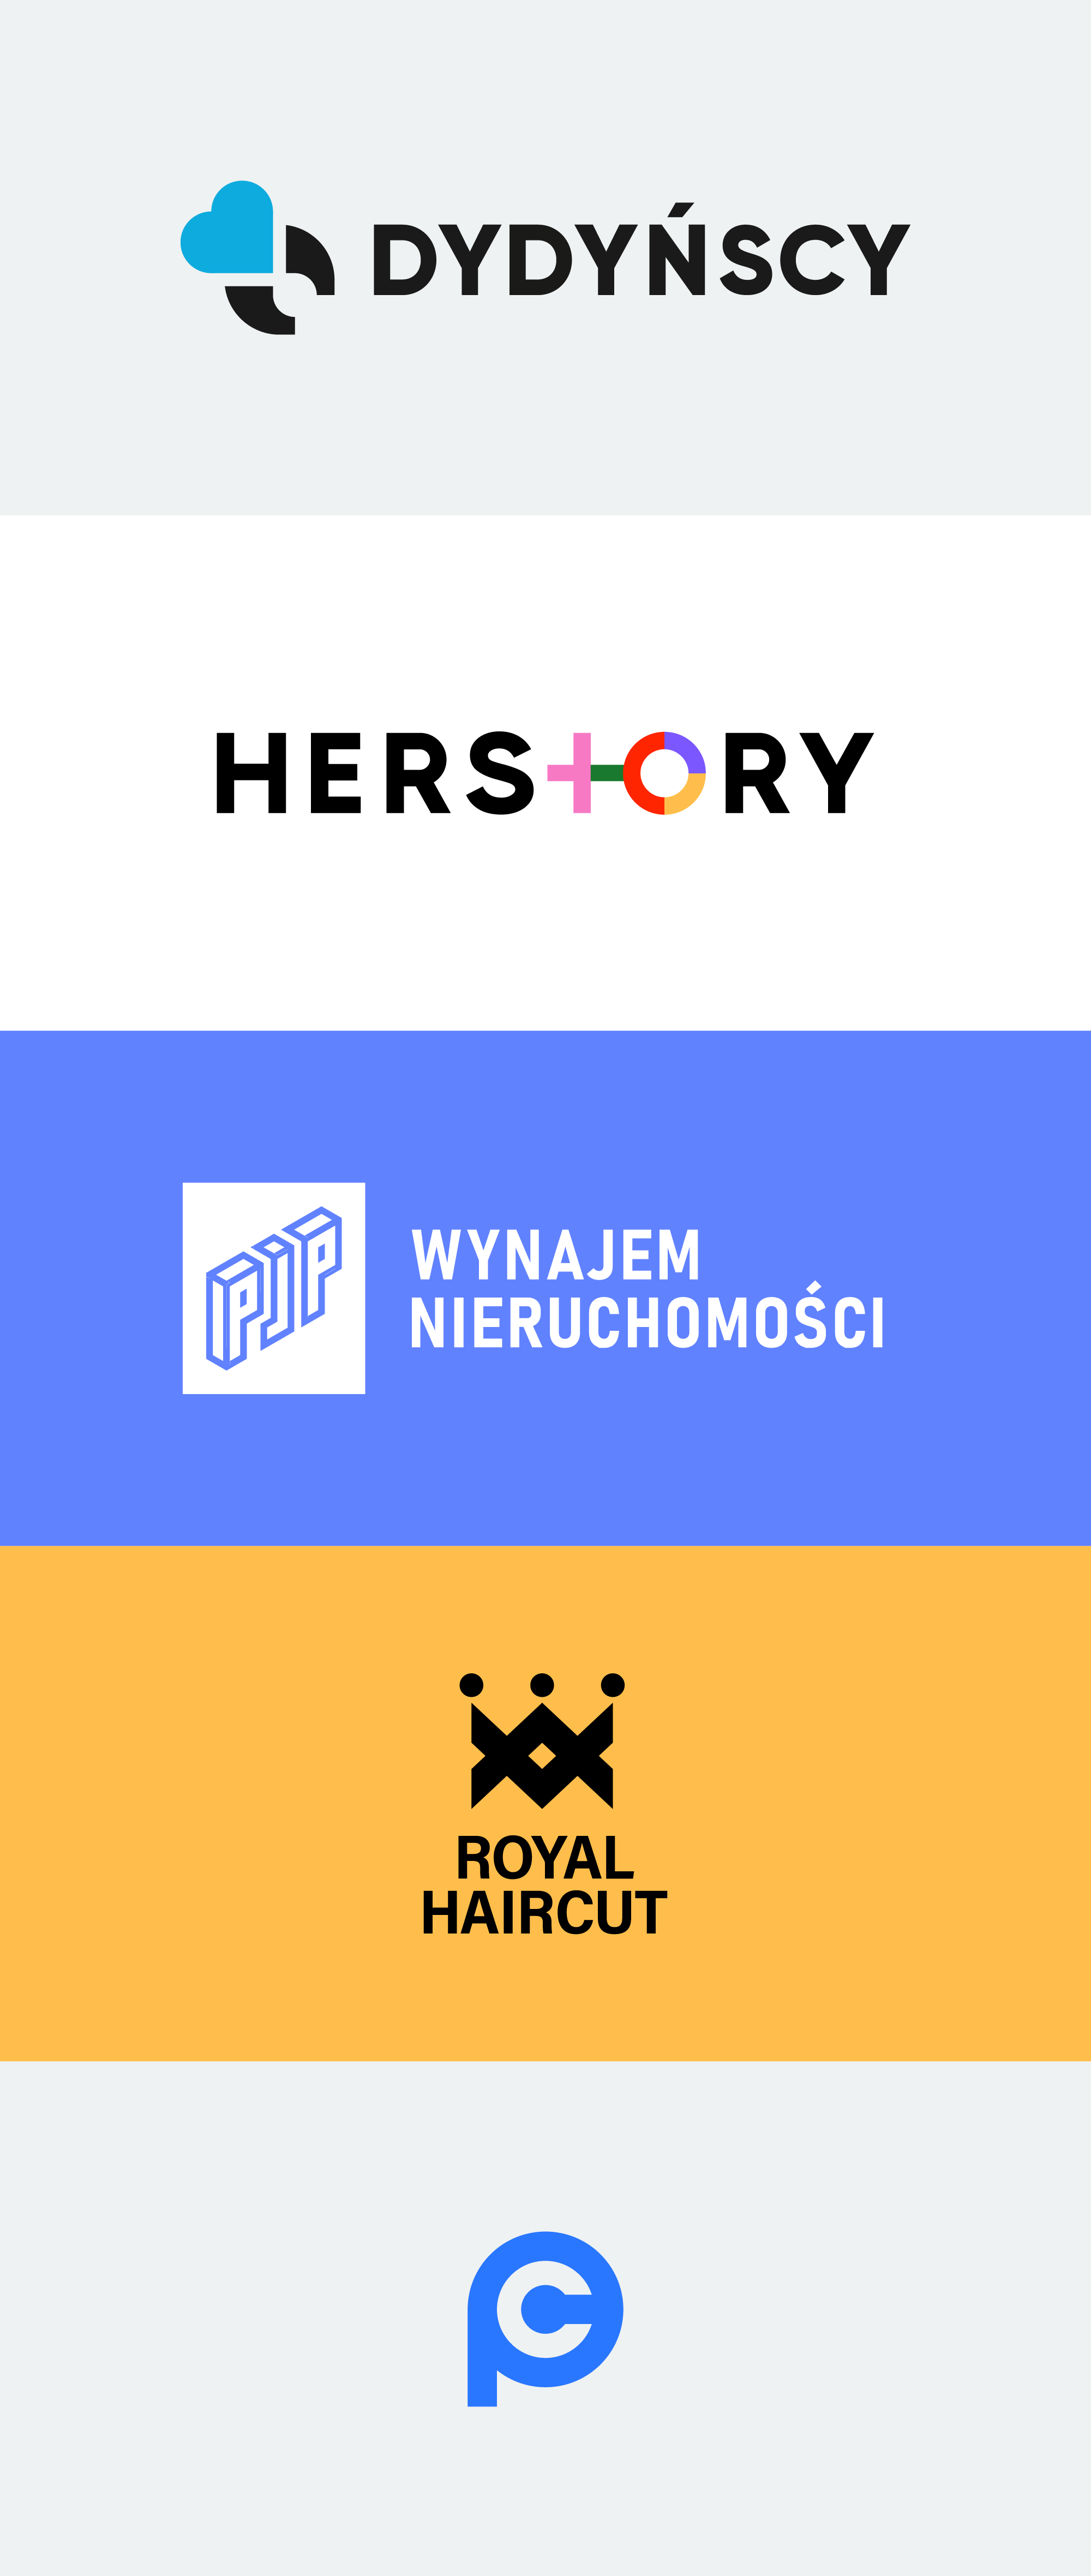 portfolio/059/157959/Logo_collection_Obszar_roboczy_1_tnsEWfM.png